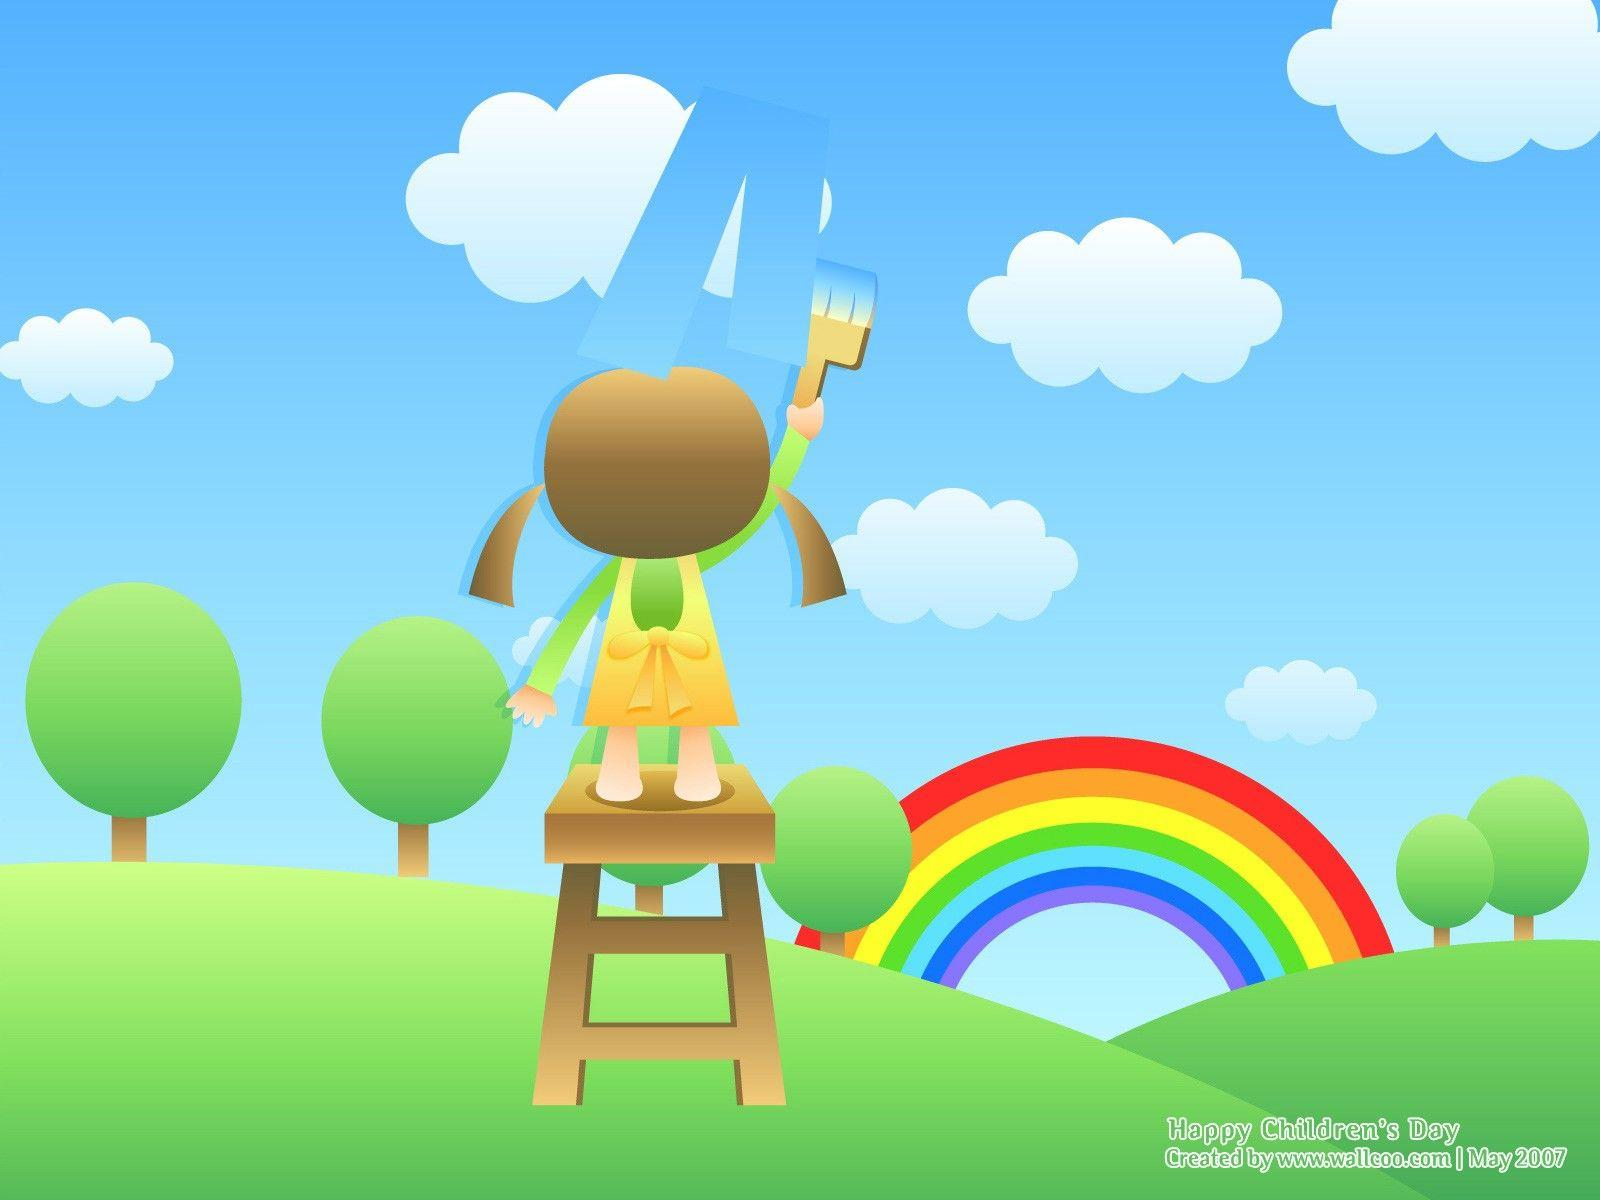 Jbt588 free kids wallpapers free kids images in best resolutions